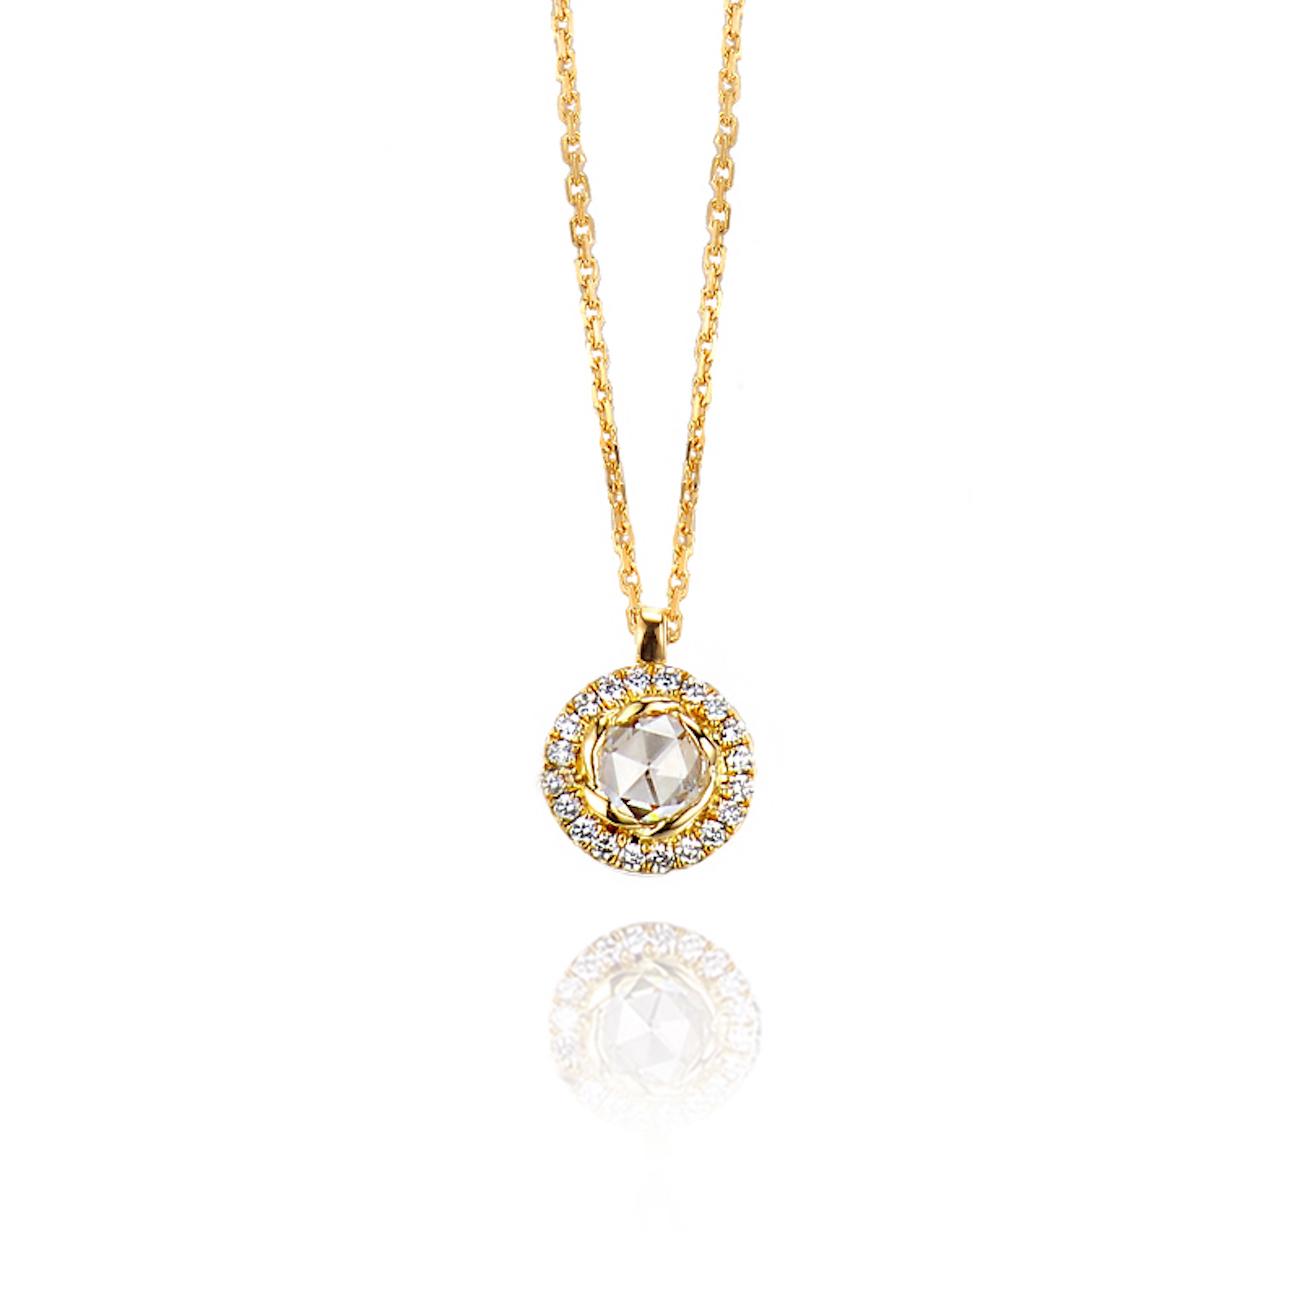 63-Signature-Twist-Bezel-Rose-Cut-Diamond-Drop-Gold-Pendant-Necklace_ALGP-01-B